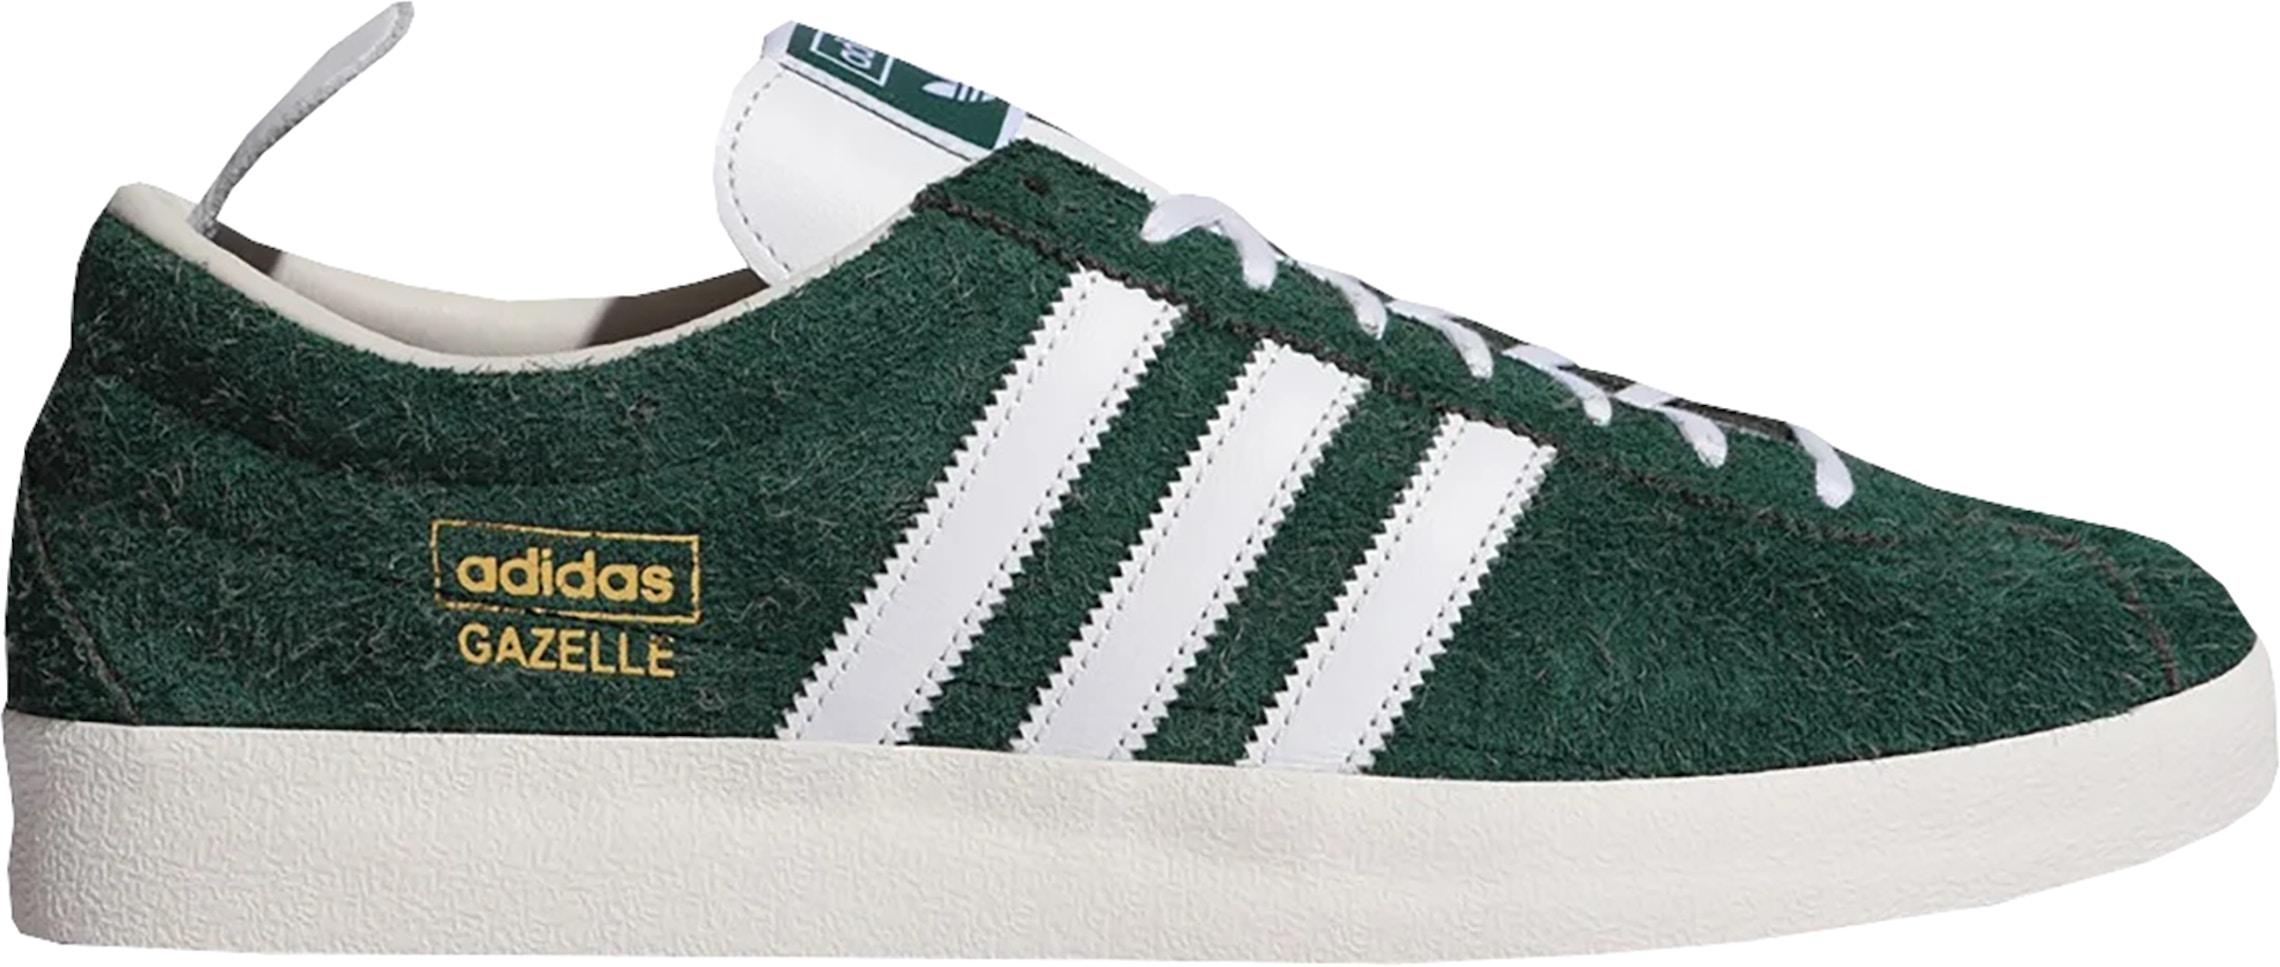 adidas Gazelle Vintage Collegiate Green